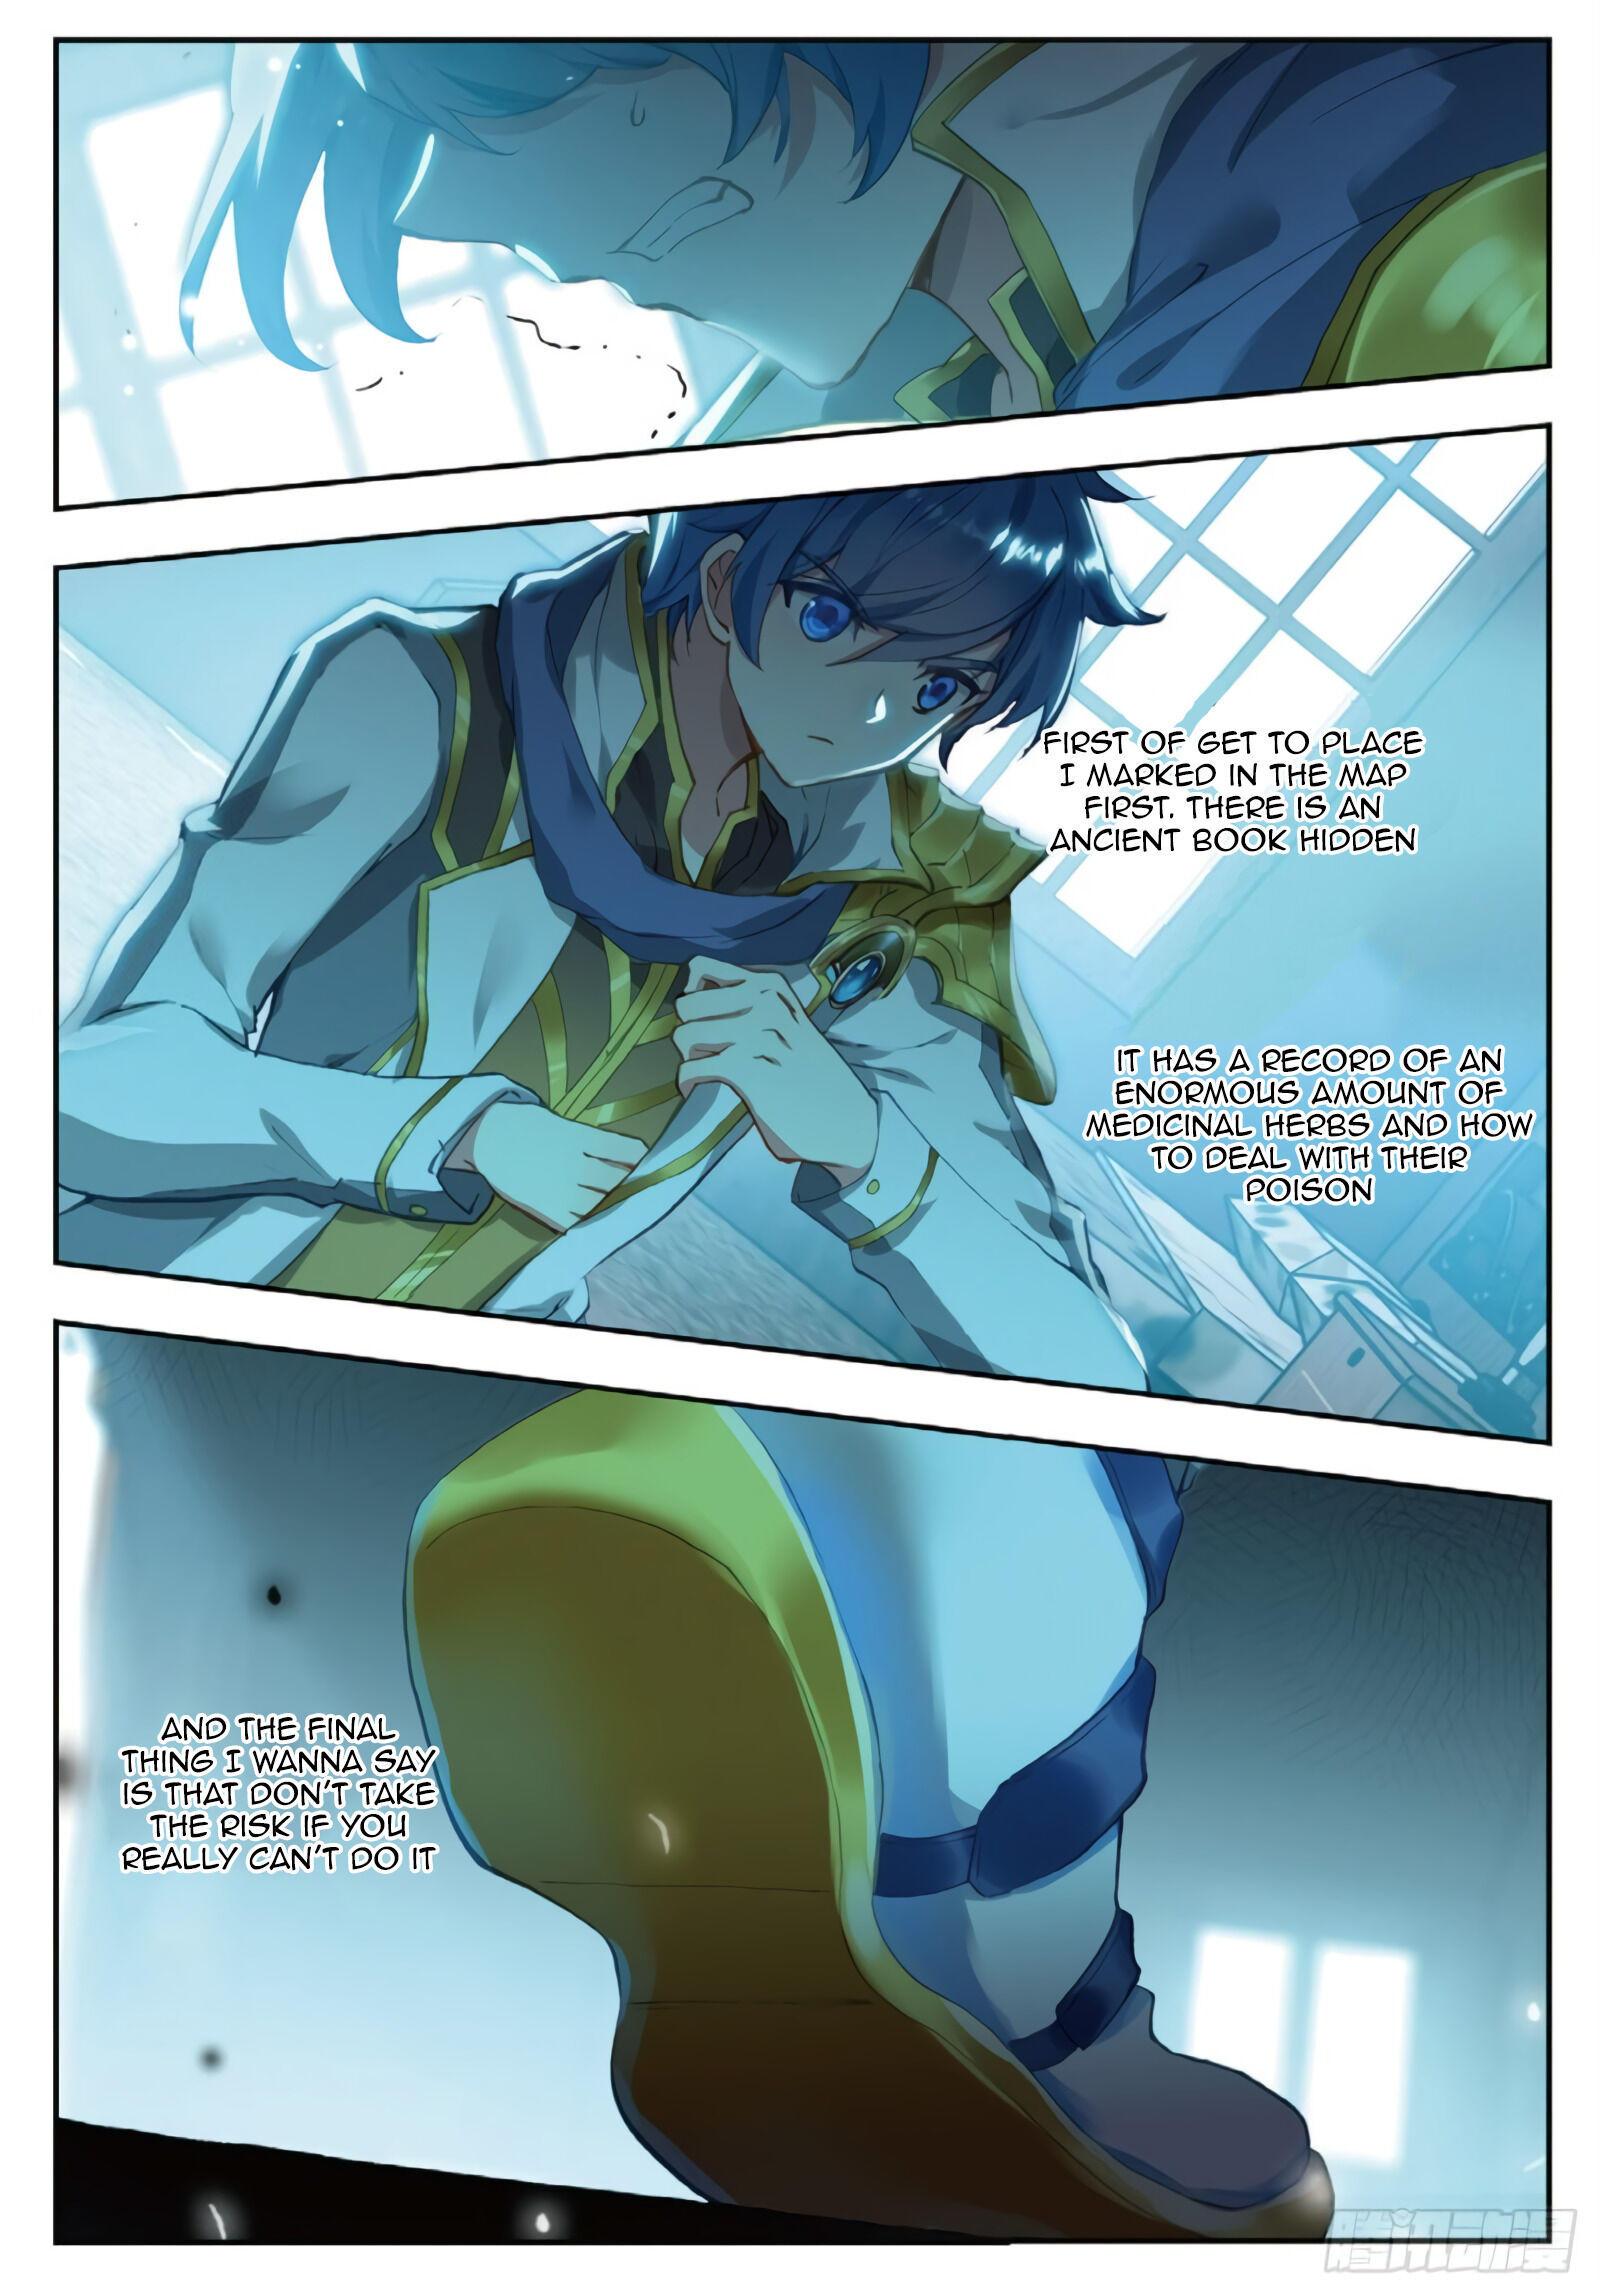 Douluo Dalu Ii - Jueshui Tangmen Chapter 283 page 7 - Mangakakalot